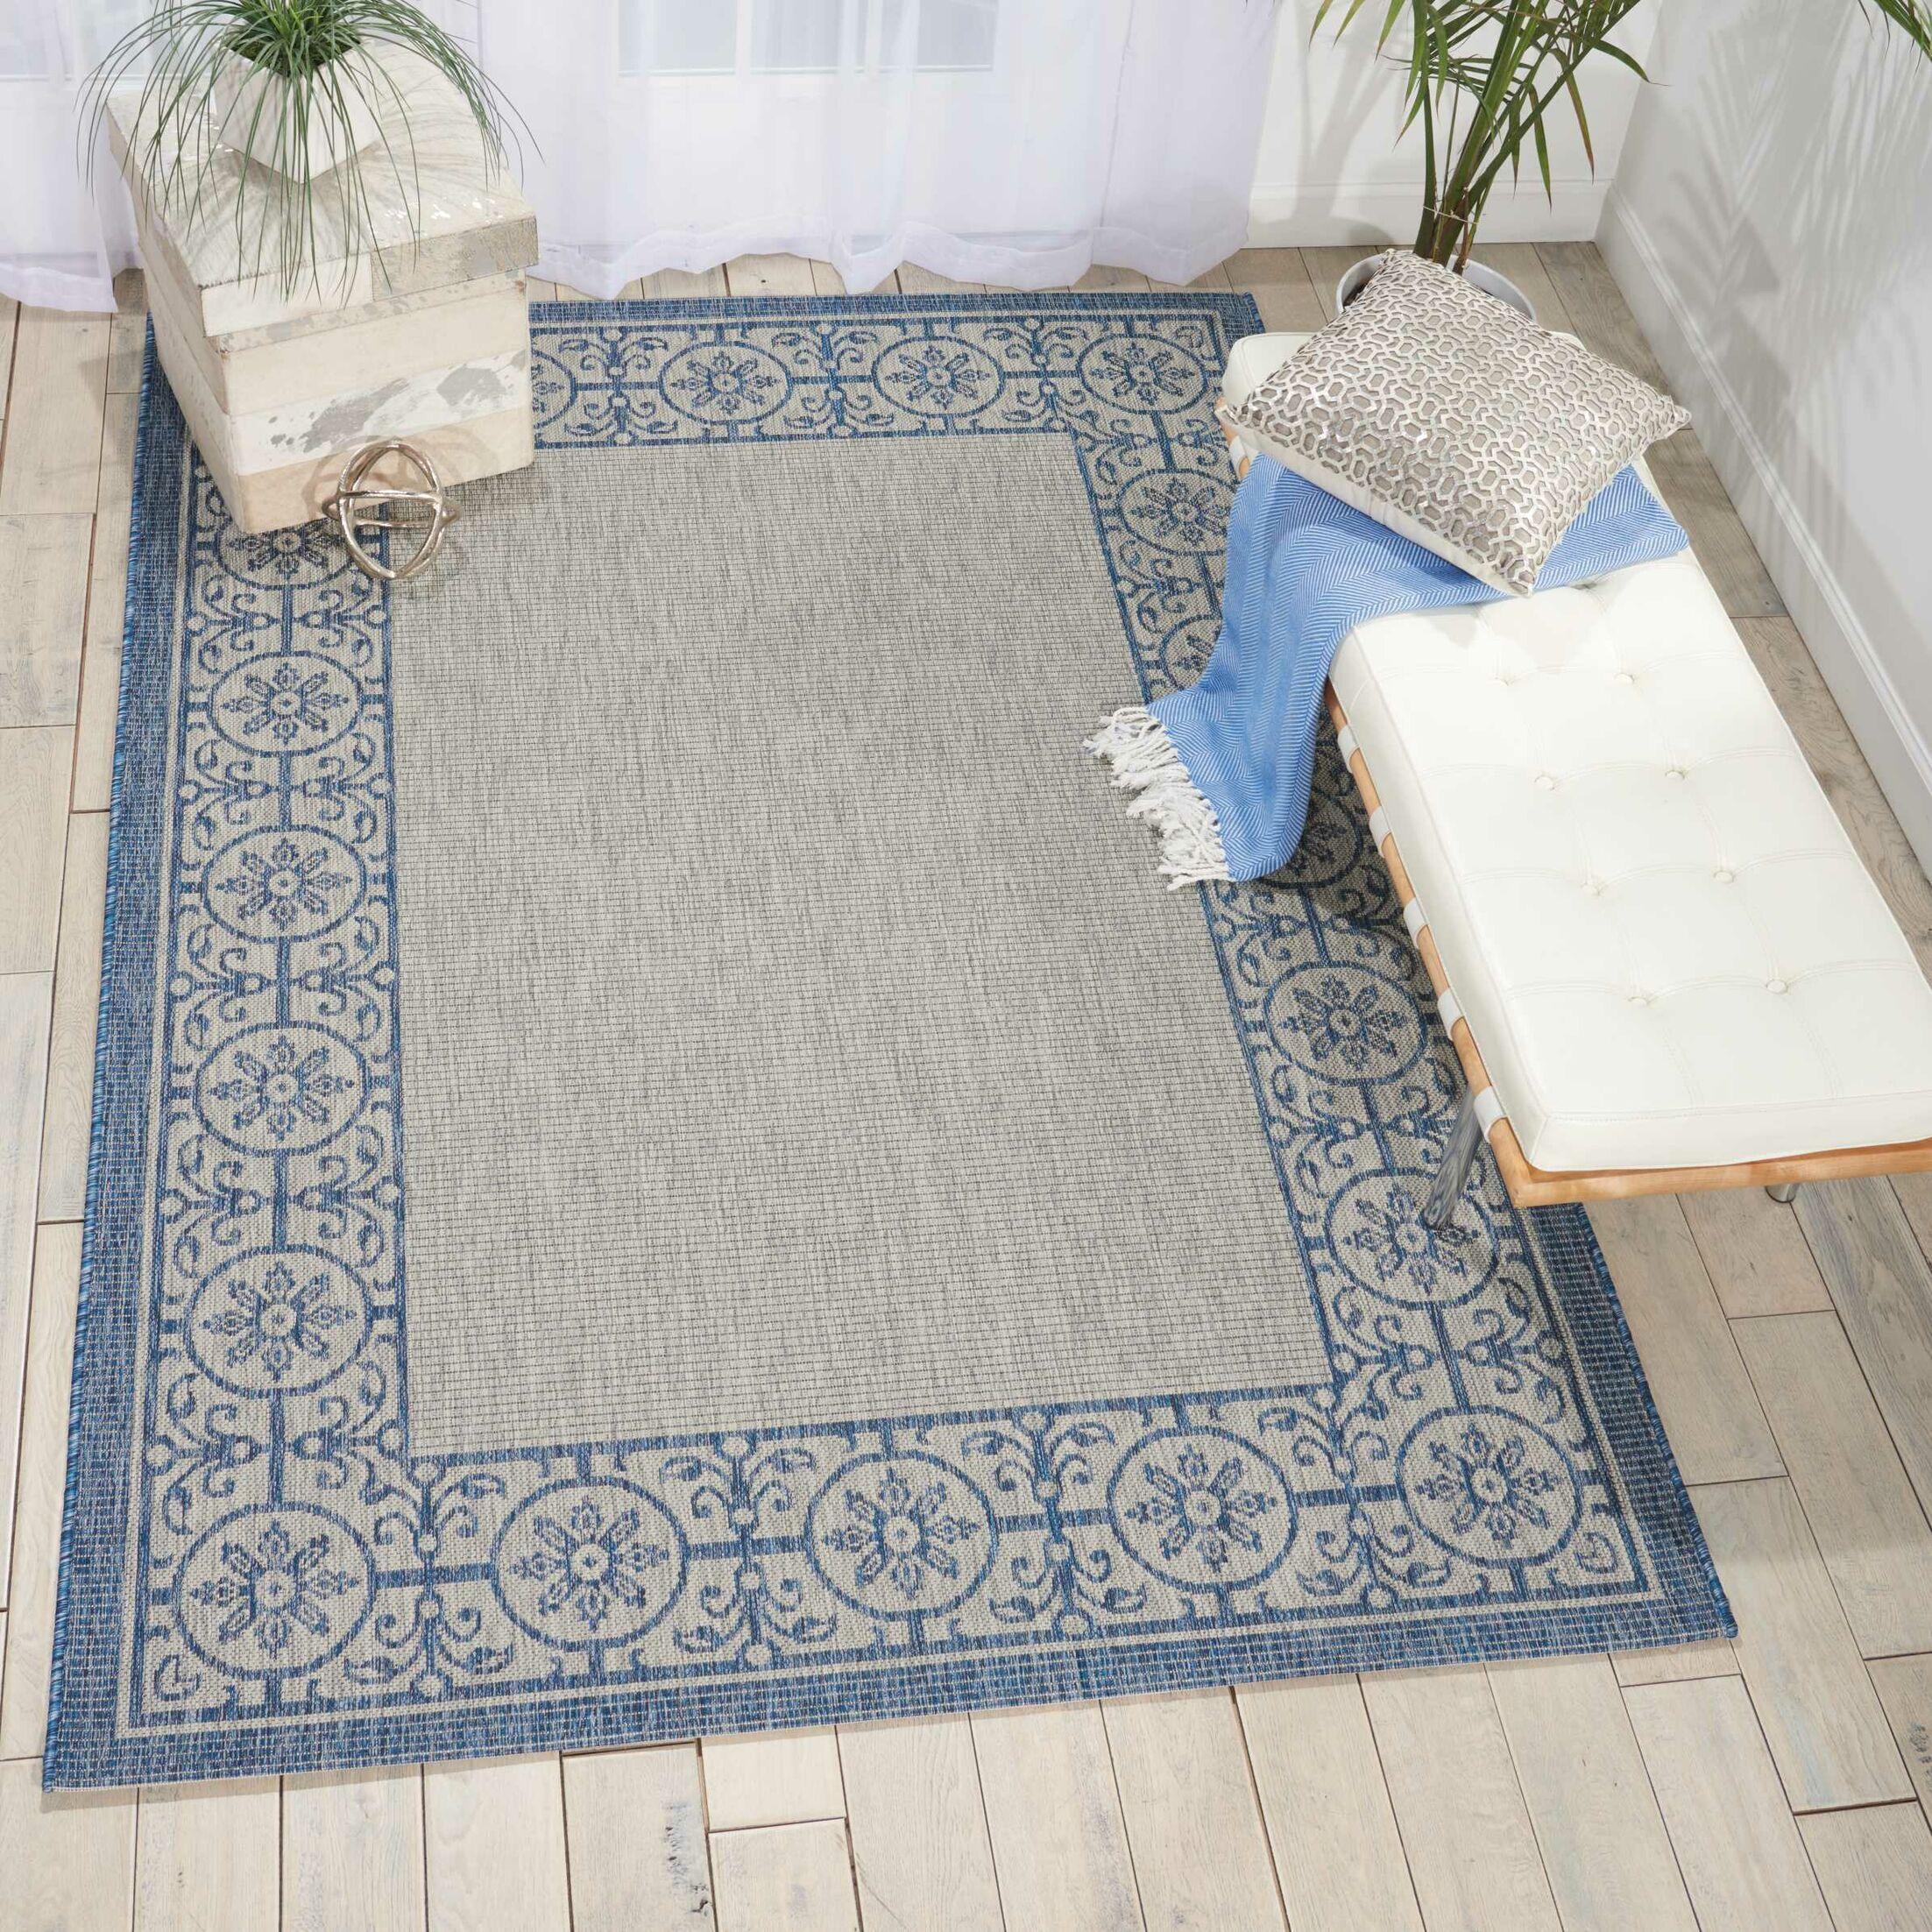 Cochrane Ivory/Blue Indoor/Outdoor Area Rug Rug Size: Rectangle 7'10